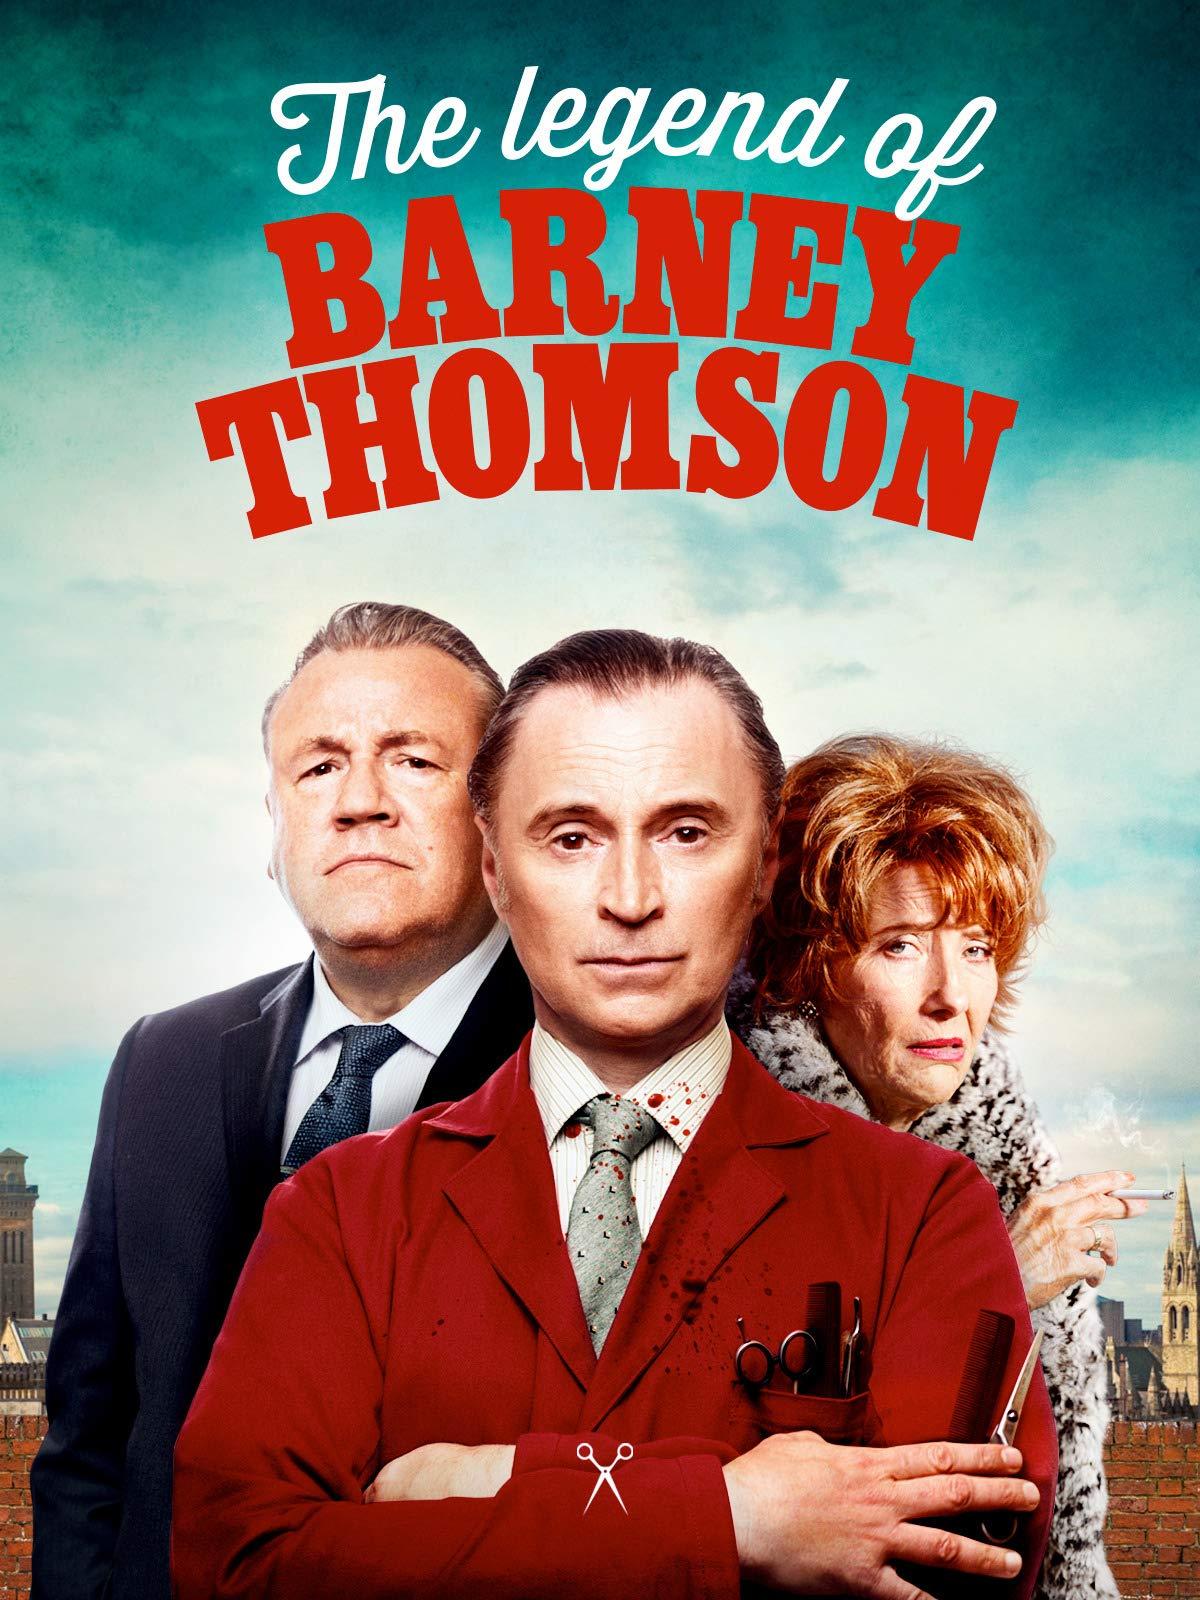 The Legend of Barney Thompson